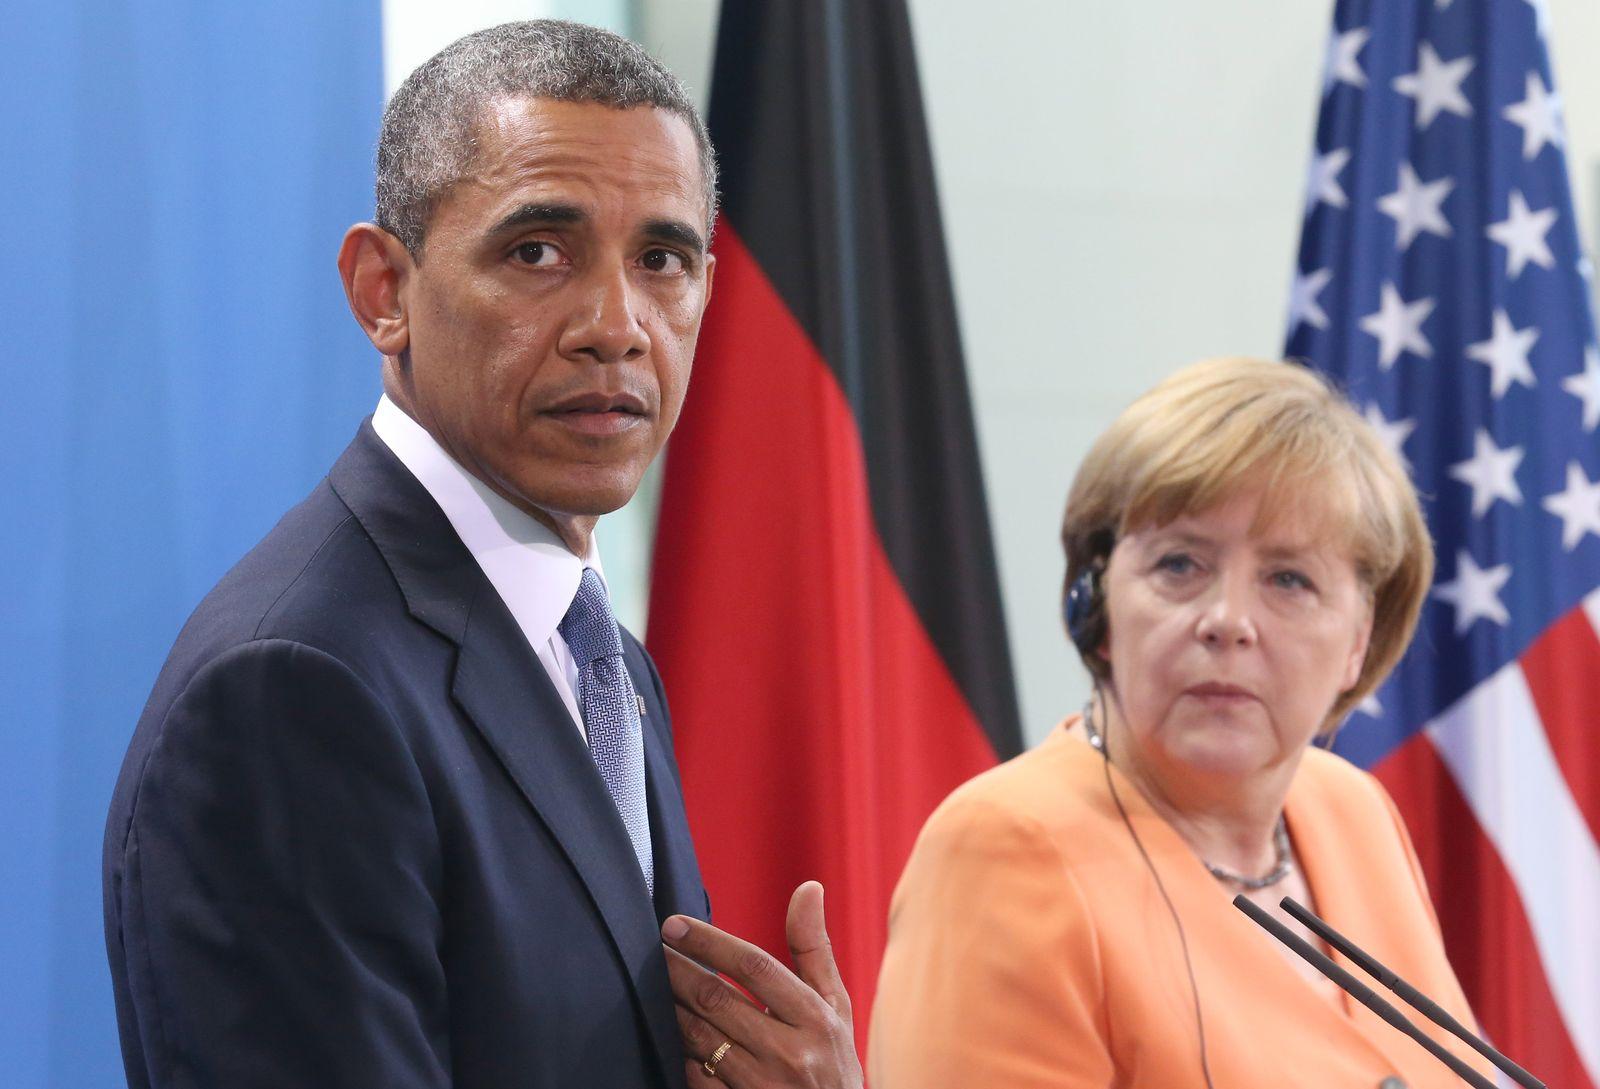 Obama/ Merkel